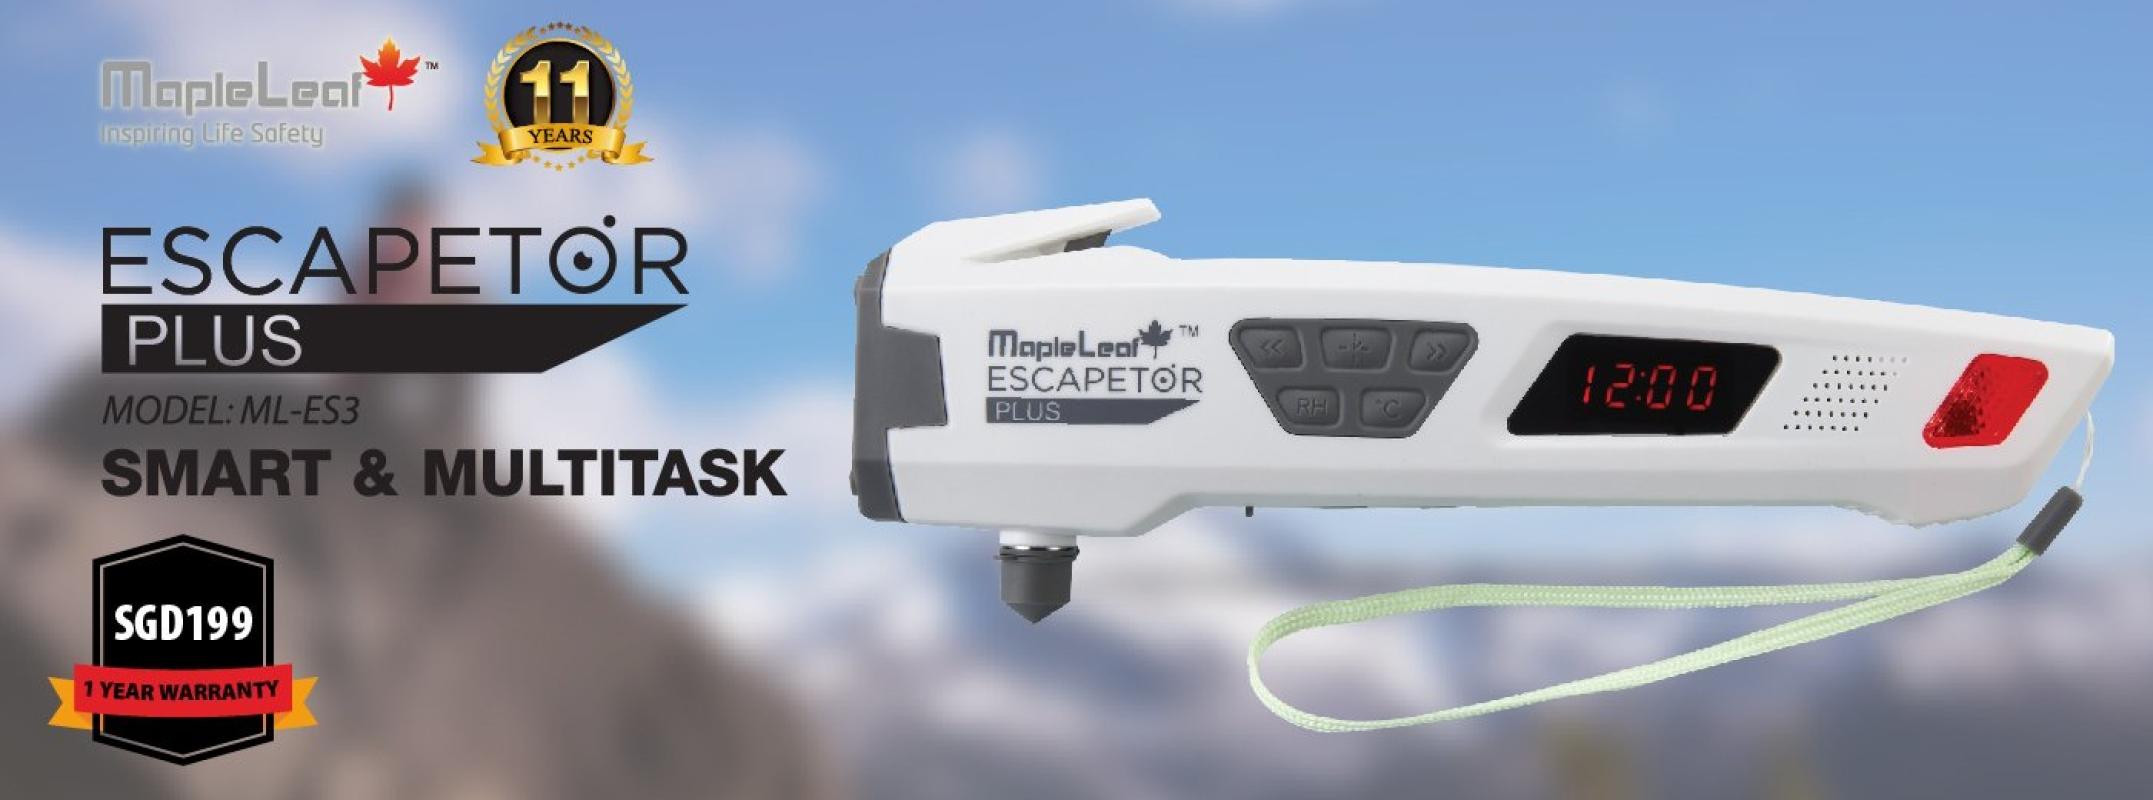 Escapetor Plus Escapetor Plus Singapore, Selangor, Malaysia, Kuala Lumpur (KL), Petaling Jaya (PJ) Supplier, Suppliers, Supply, Supplies | MapleLeaf